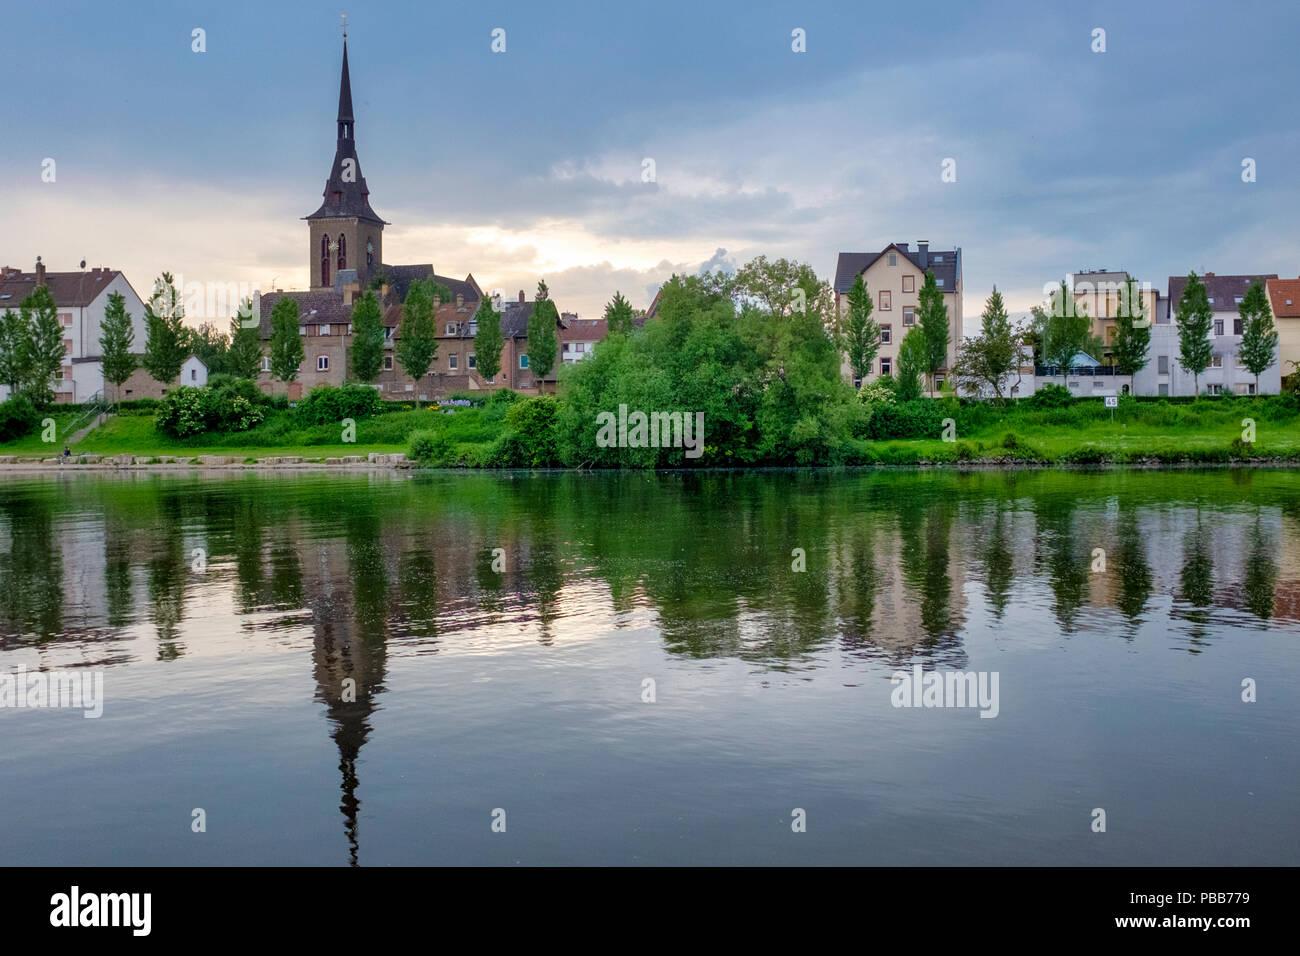 Fechenheim, Frankfurt am Main, Germany - Stock Image